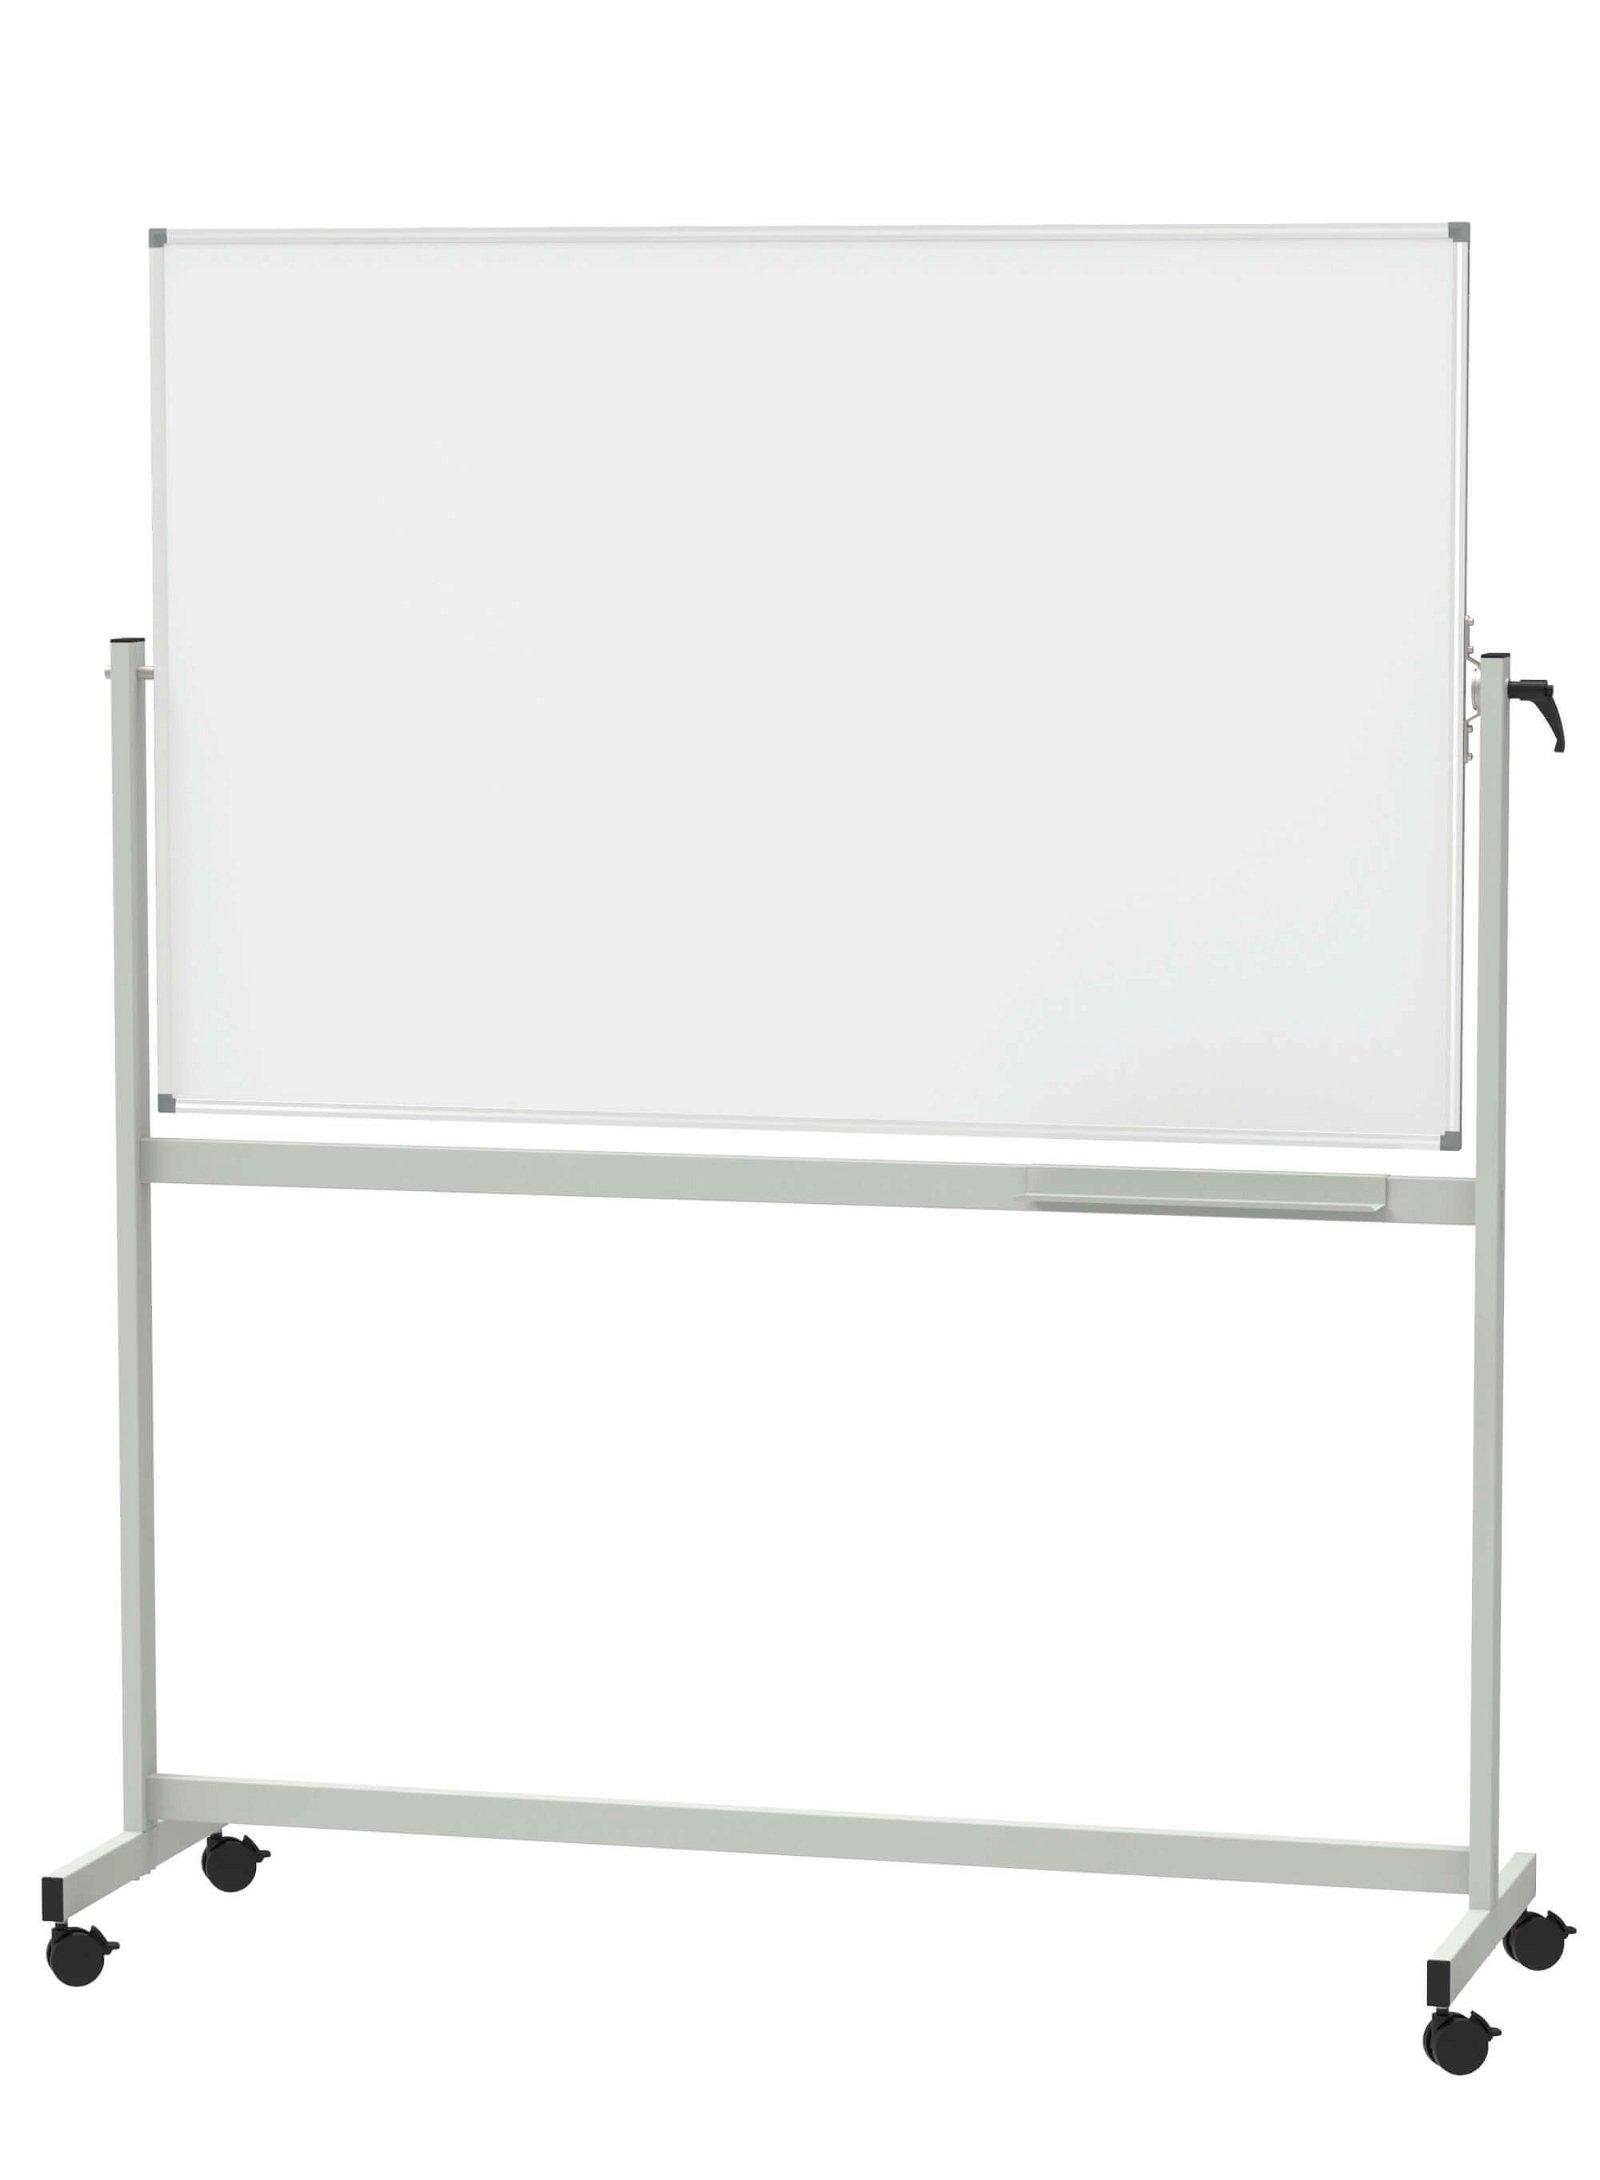 Mobiles Whiteb. MAULstandard, drehbar, Emaille, 100x150 cm, grau